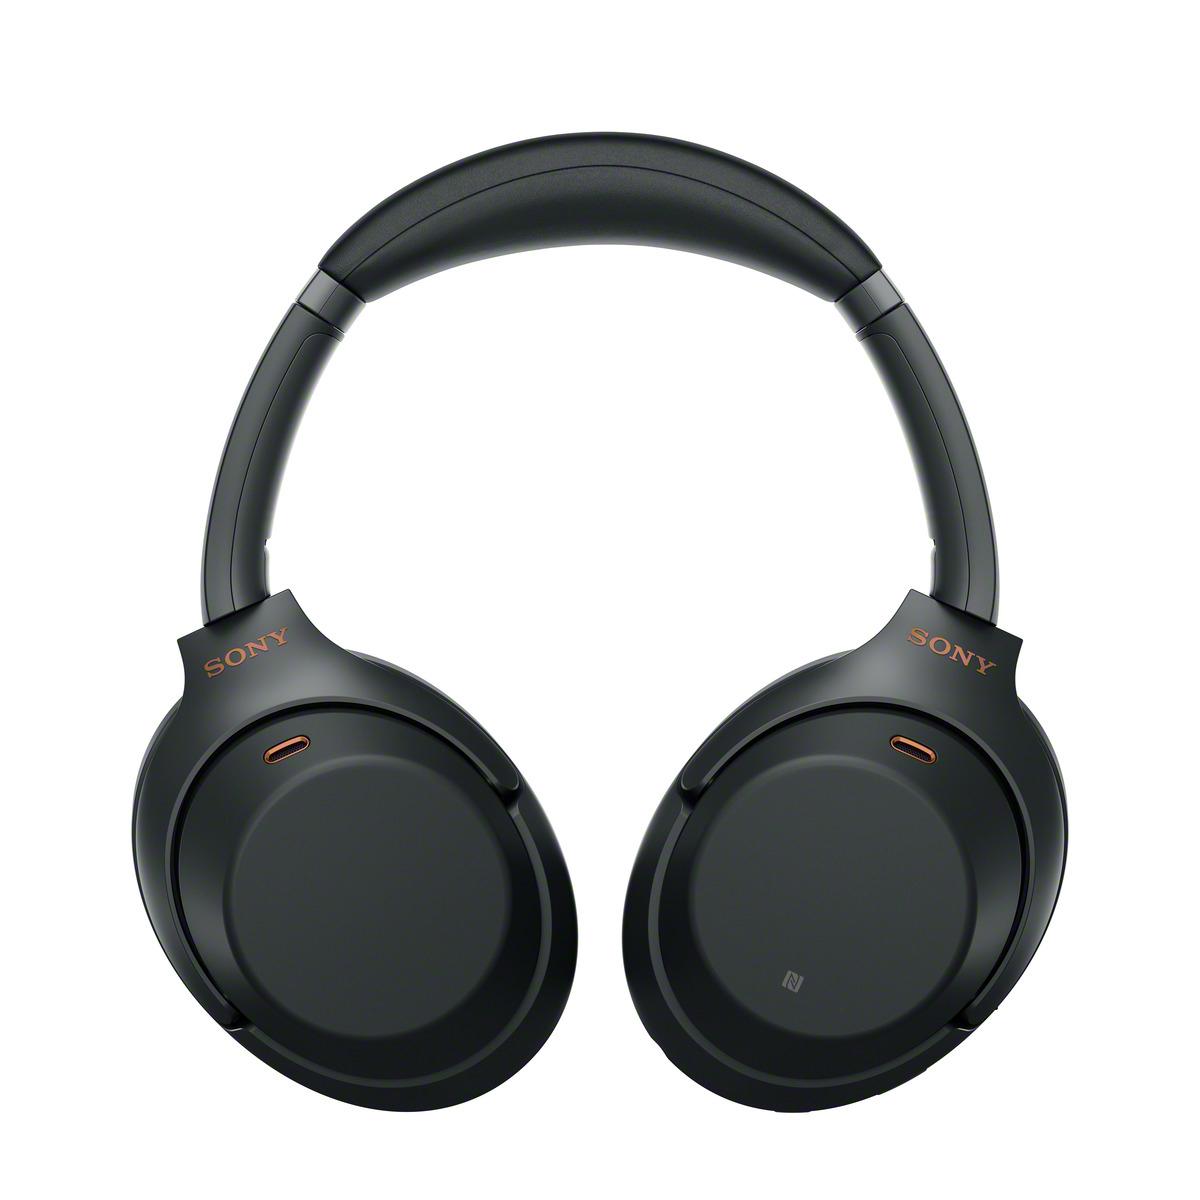 Cuffie WH-1000XM3 di Sony 57e27b3fef8e